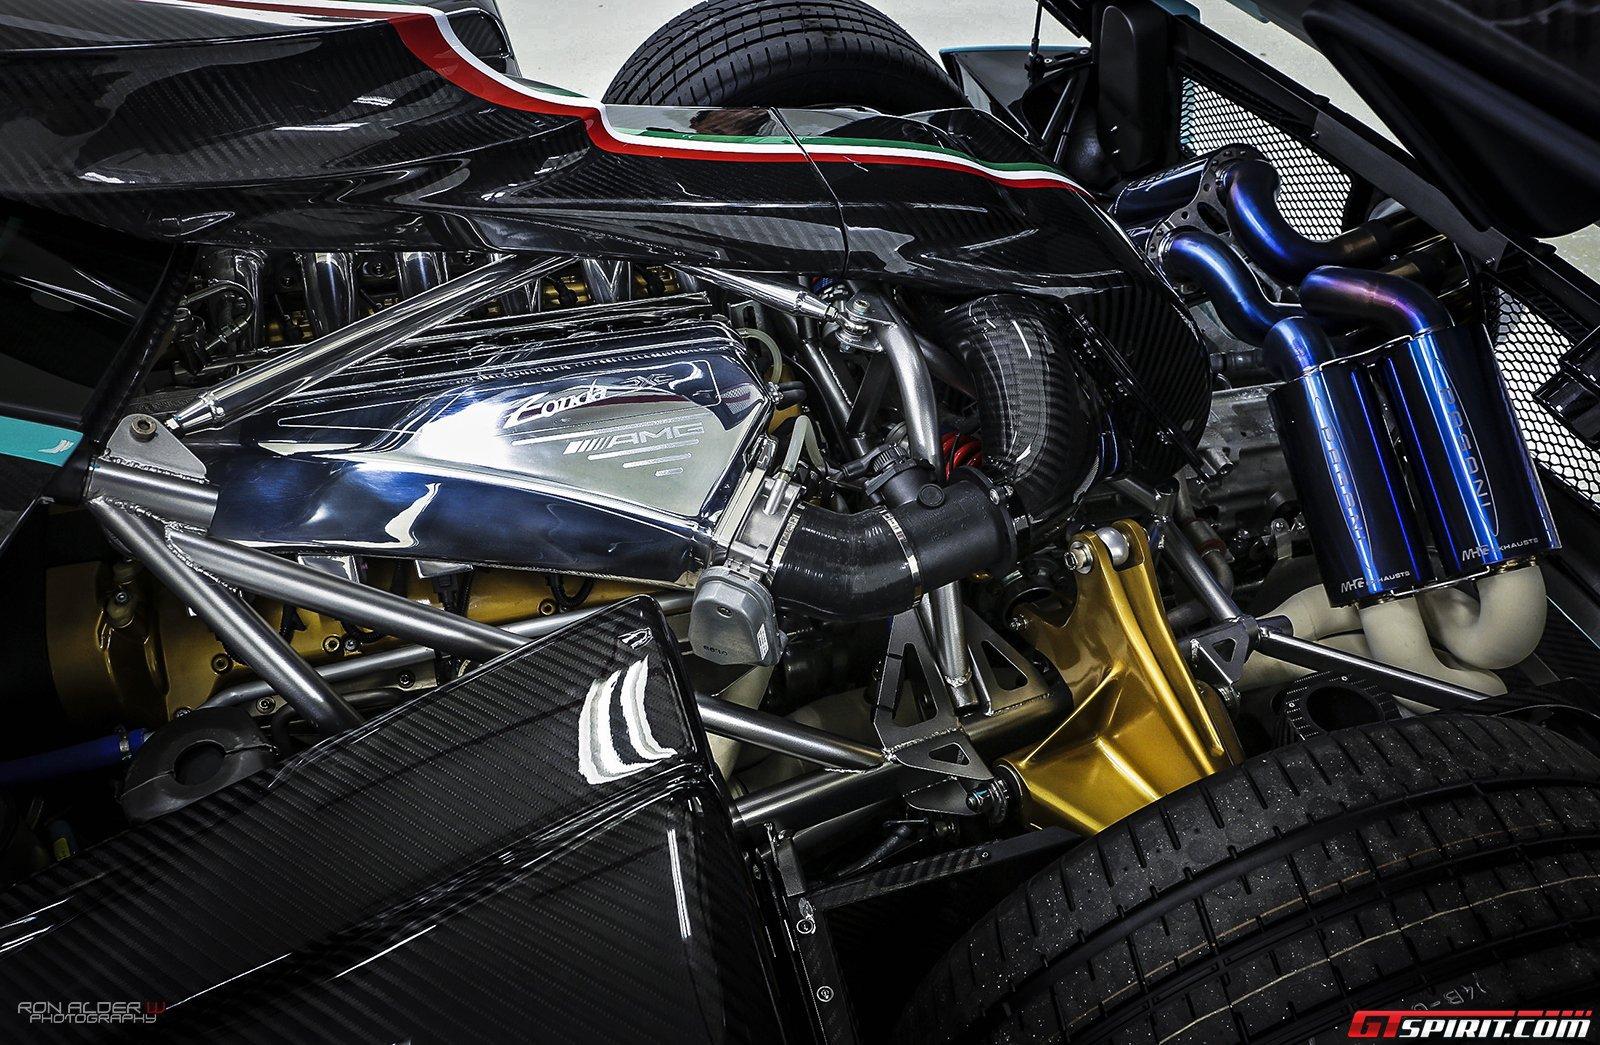 Pagani Zonda 760rsjx Is A Unique Hypercar As Mad As A Box